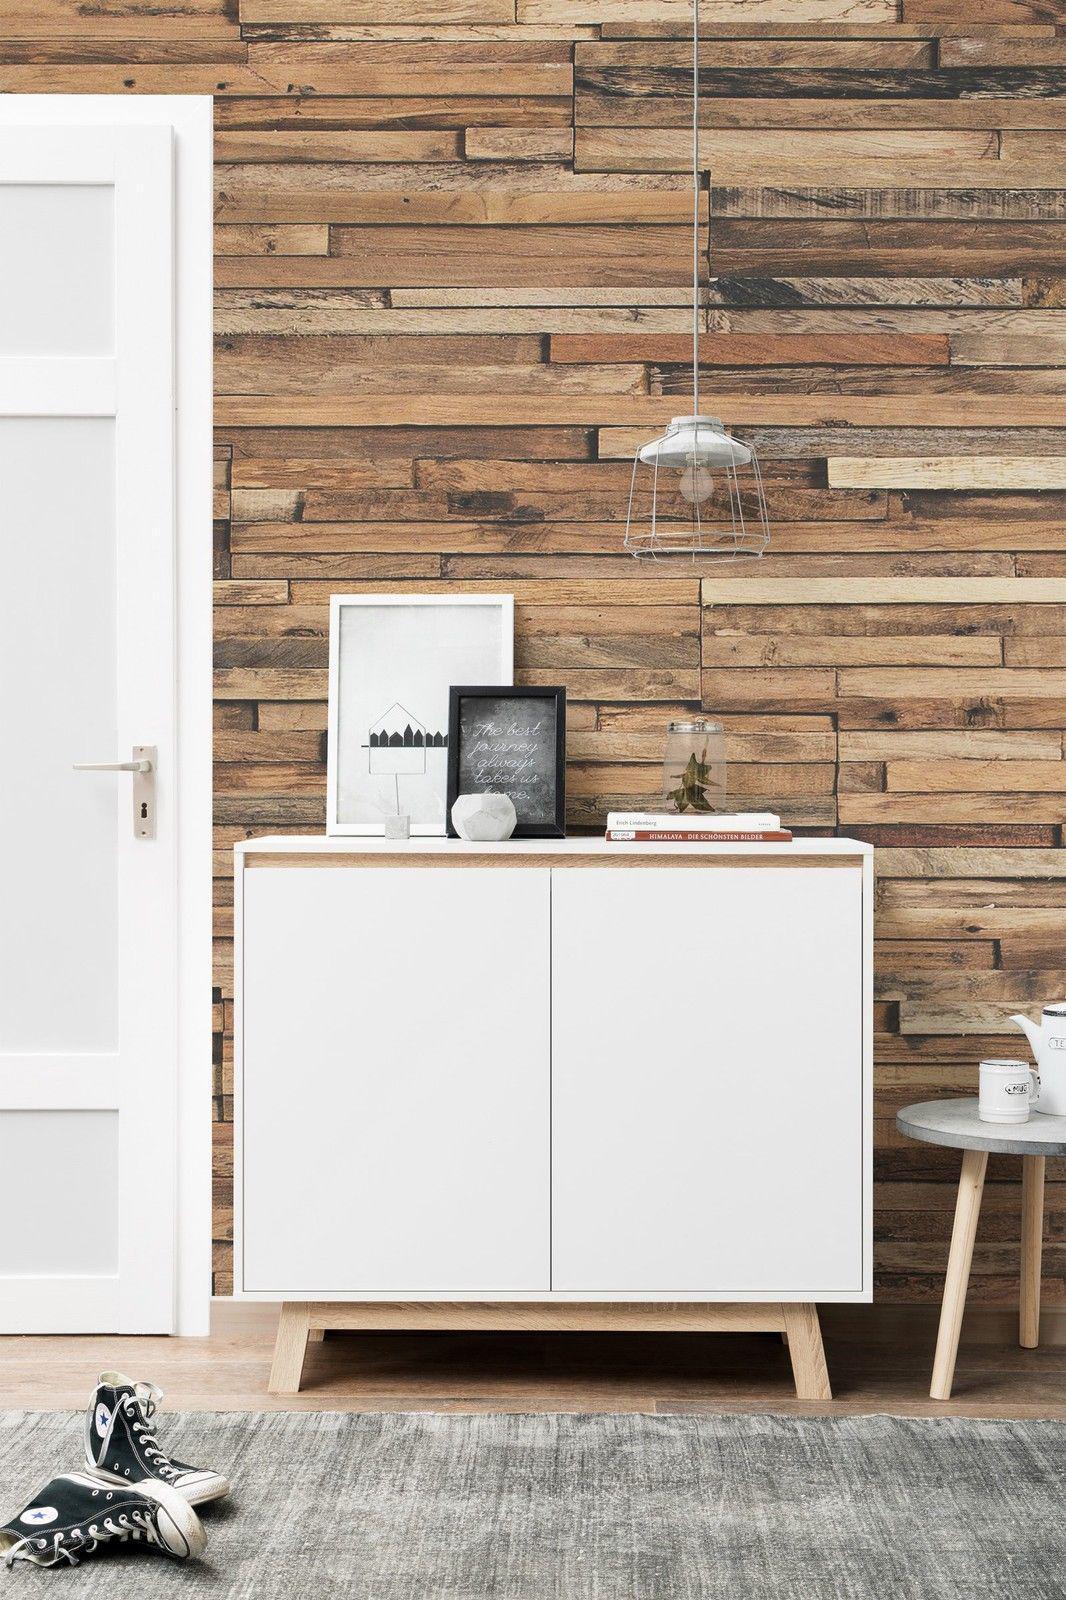 kommode today wei matt mit sockel in echtholz design kaufen bei sylwia lesniewska fun. Black Bedroom Furniture Sets. Home Design Ideas